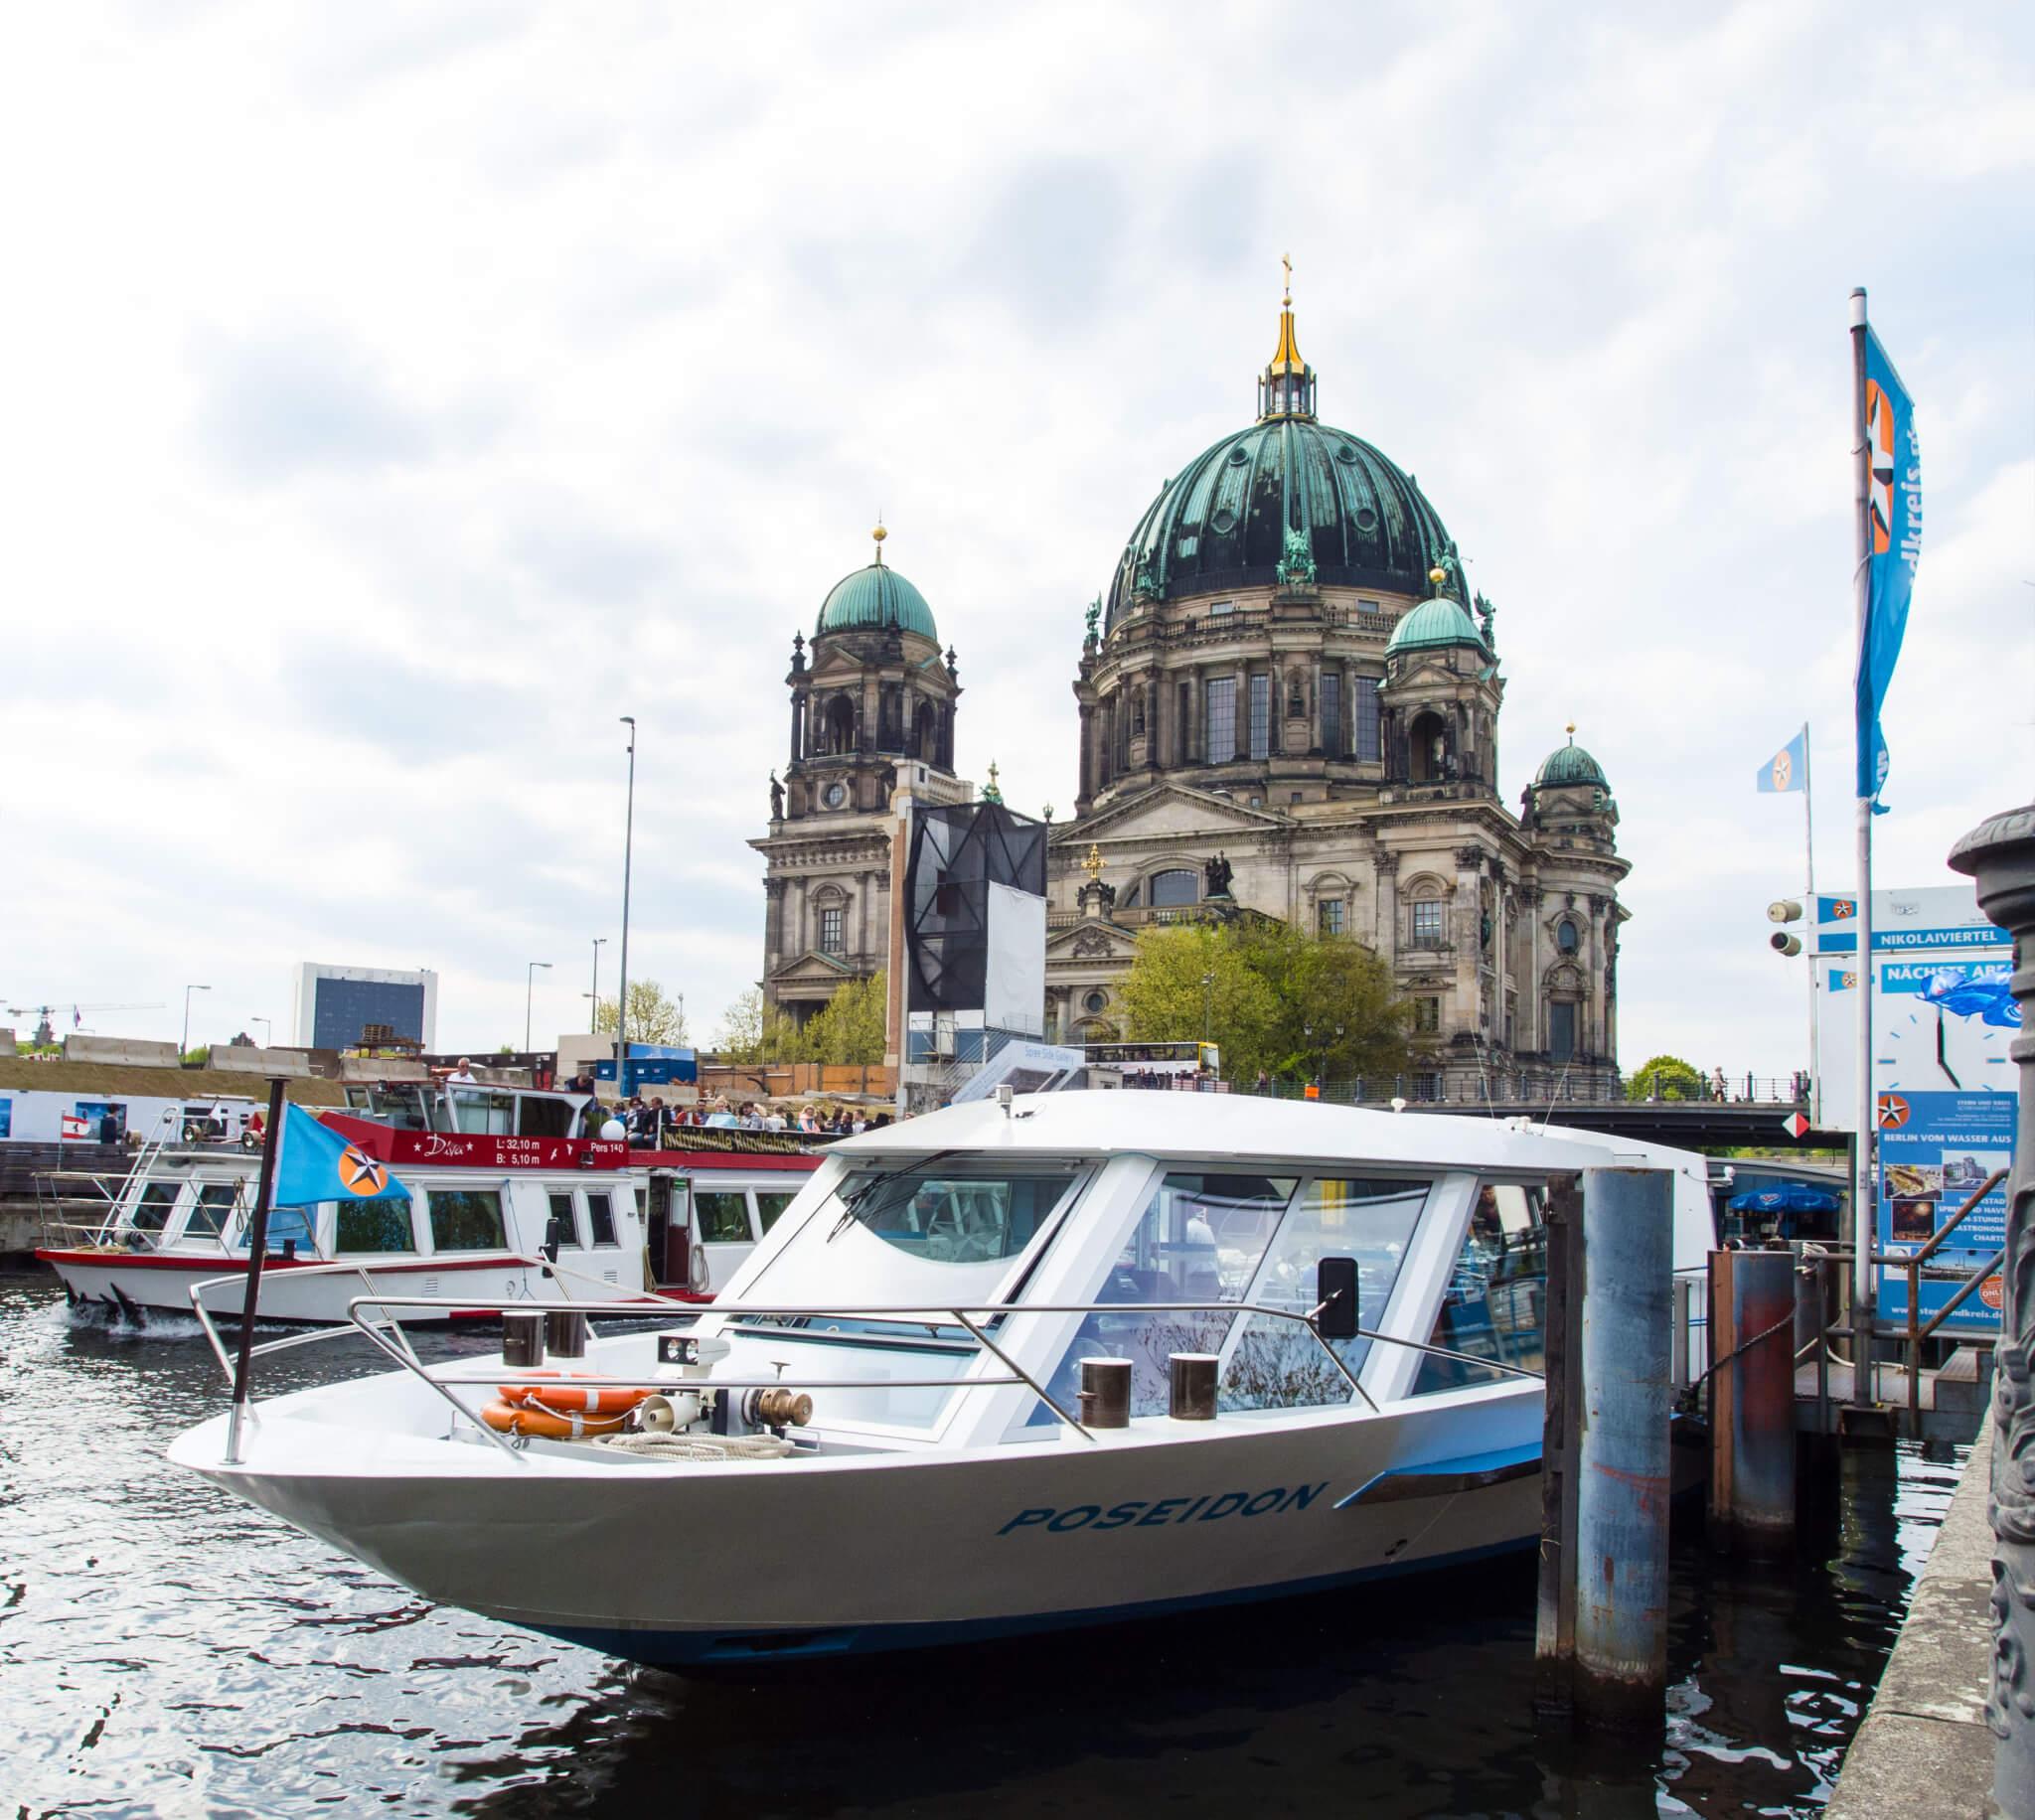 Anlegestelle Nikolaiviertel - Blick auf den Berliner Dom